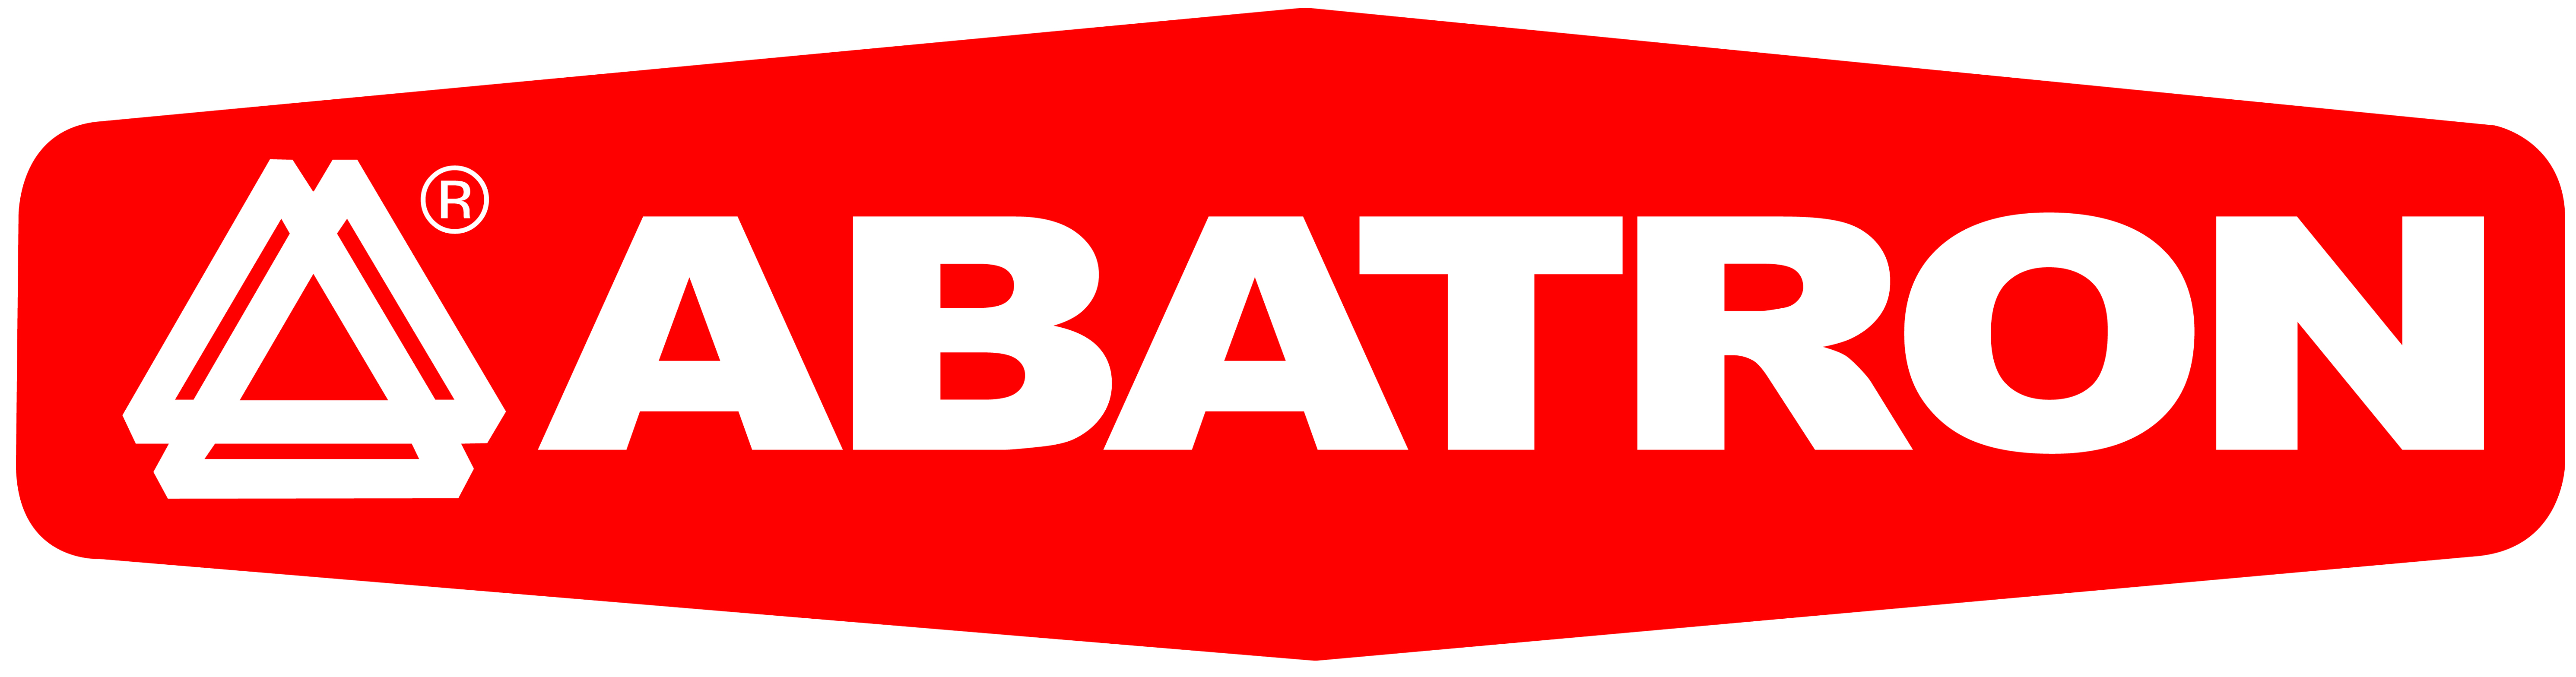 abatron-logo